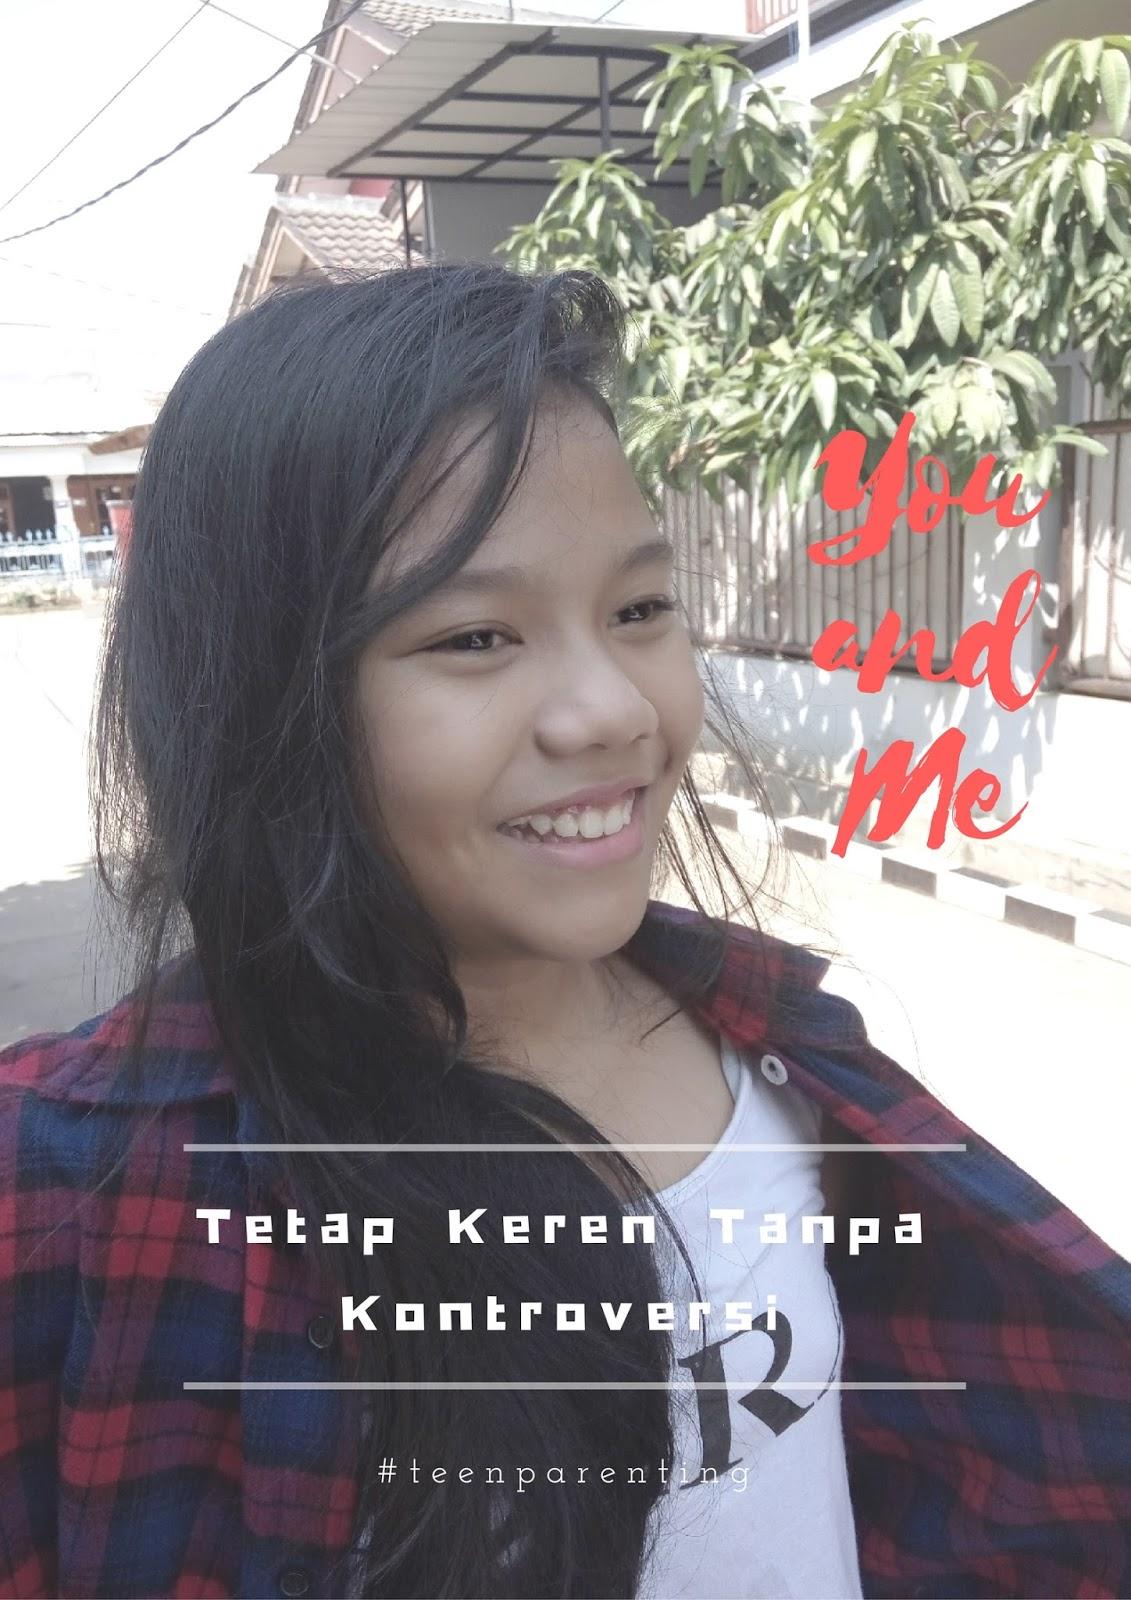 Tetap Keren Tanpa Kontroversi TEEN PARENTING Diary Of A Not